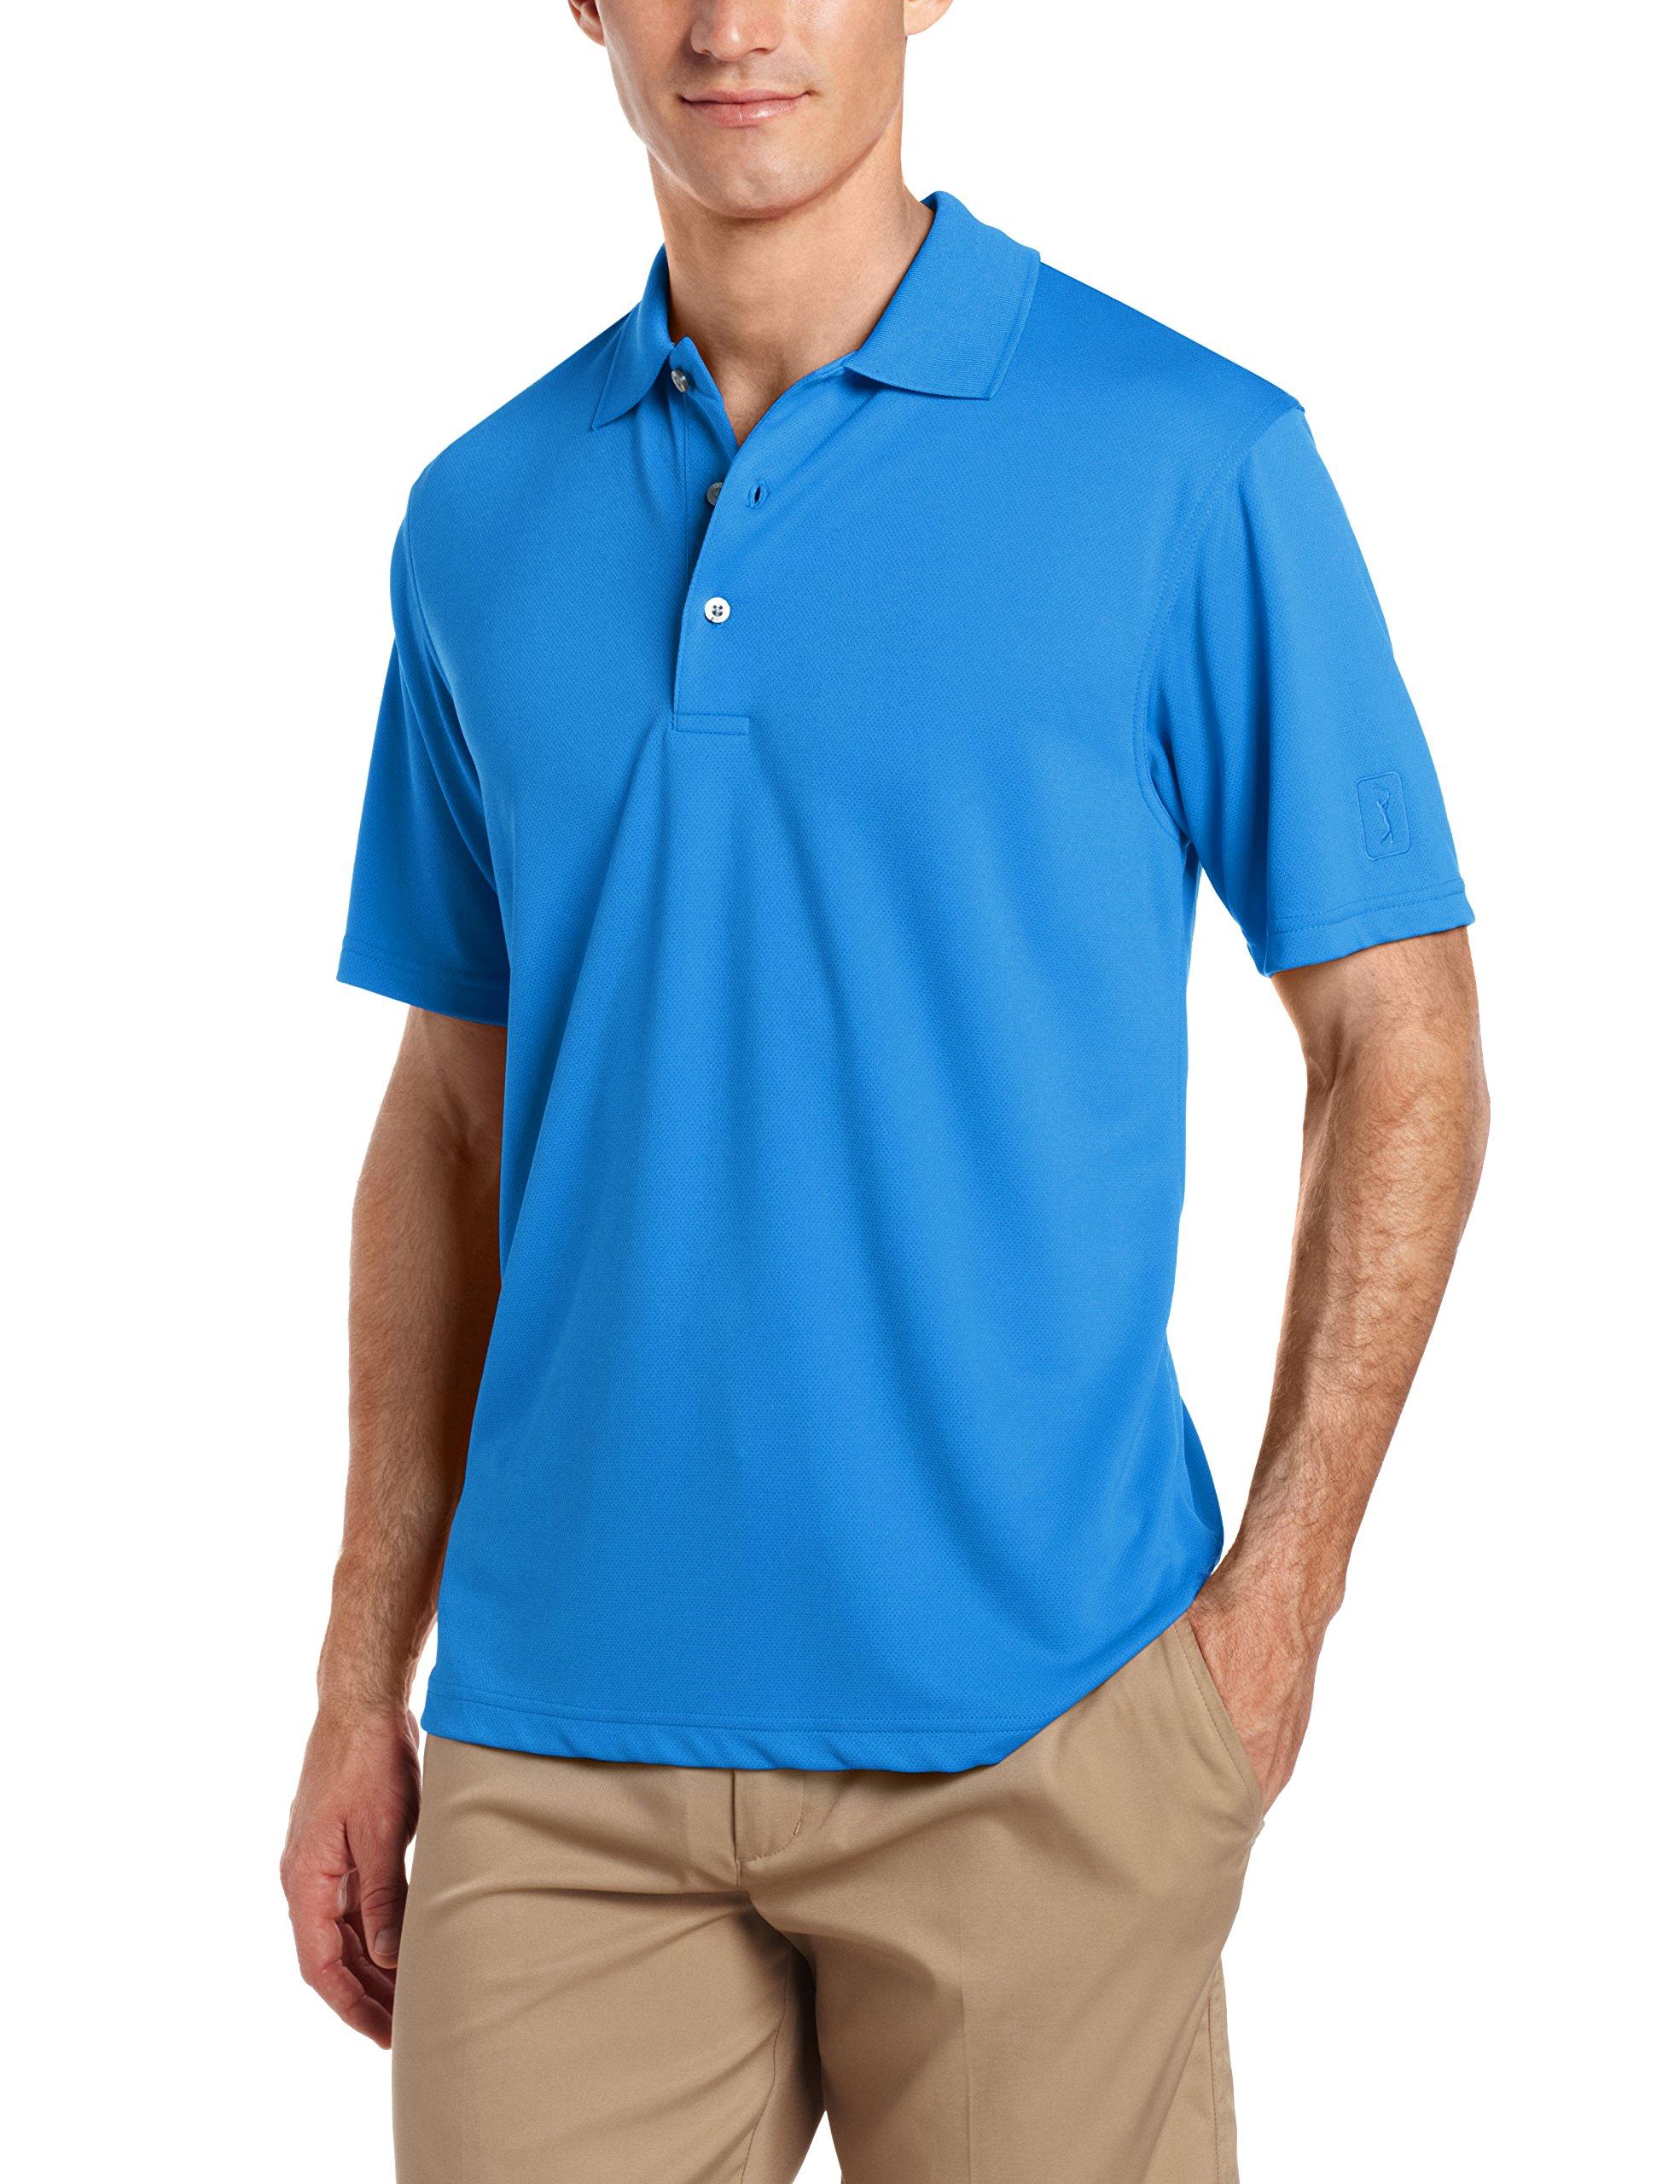 PGA TOUR Men's Short Sleeve Airflux Solid Polo Shirt, Classic Blue S